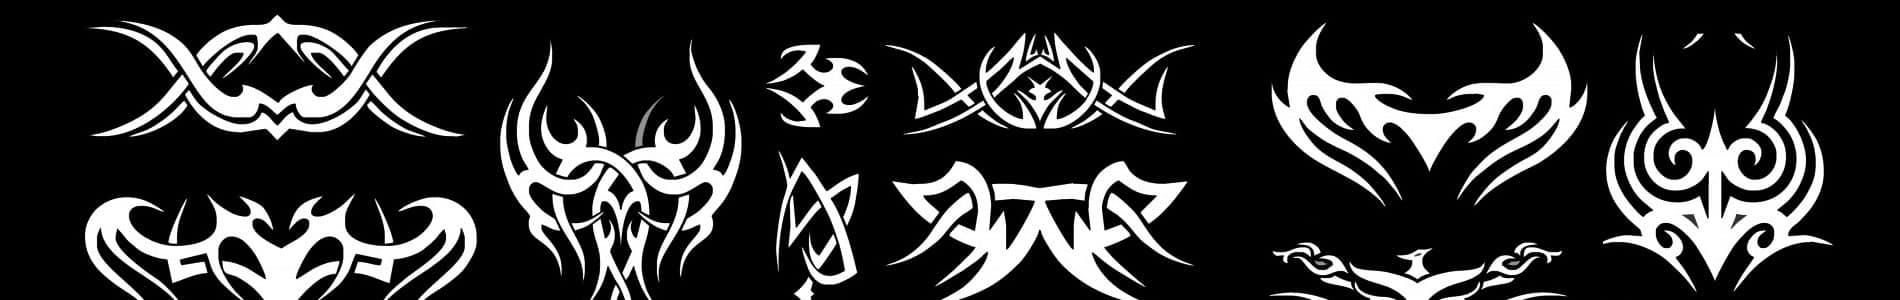 Tribal tattoo banner